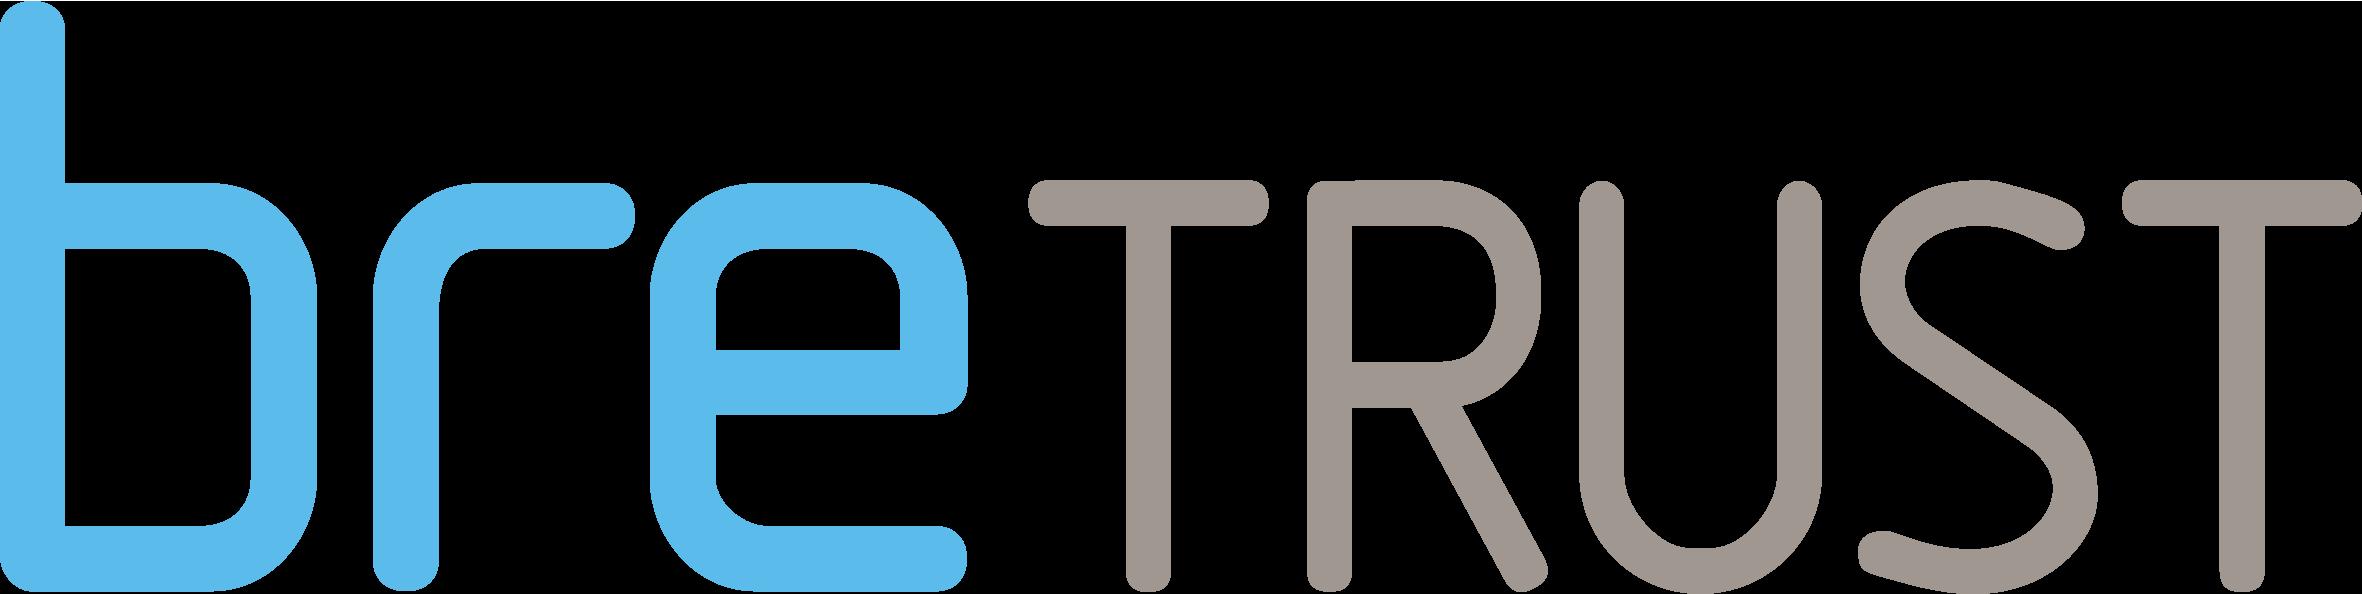 BRE Trust blue logo